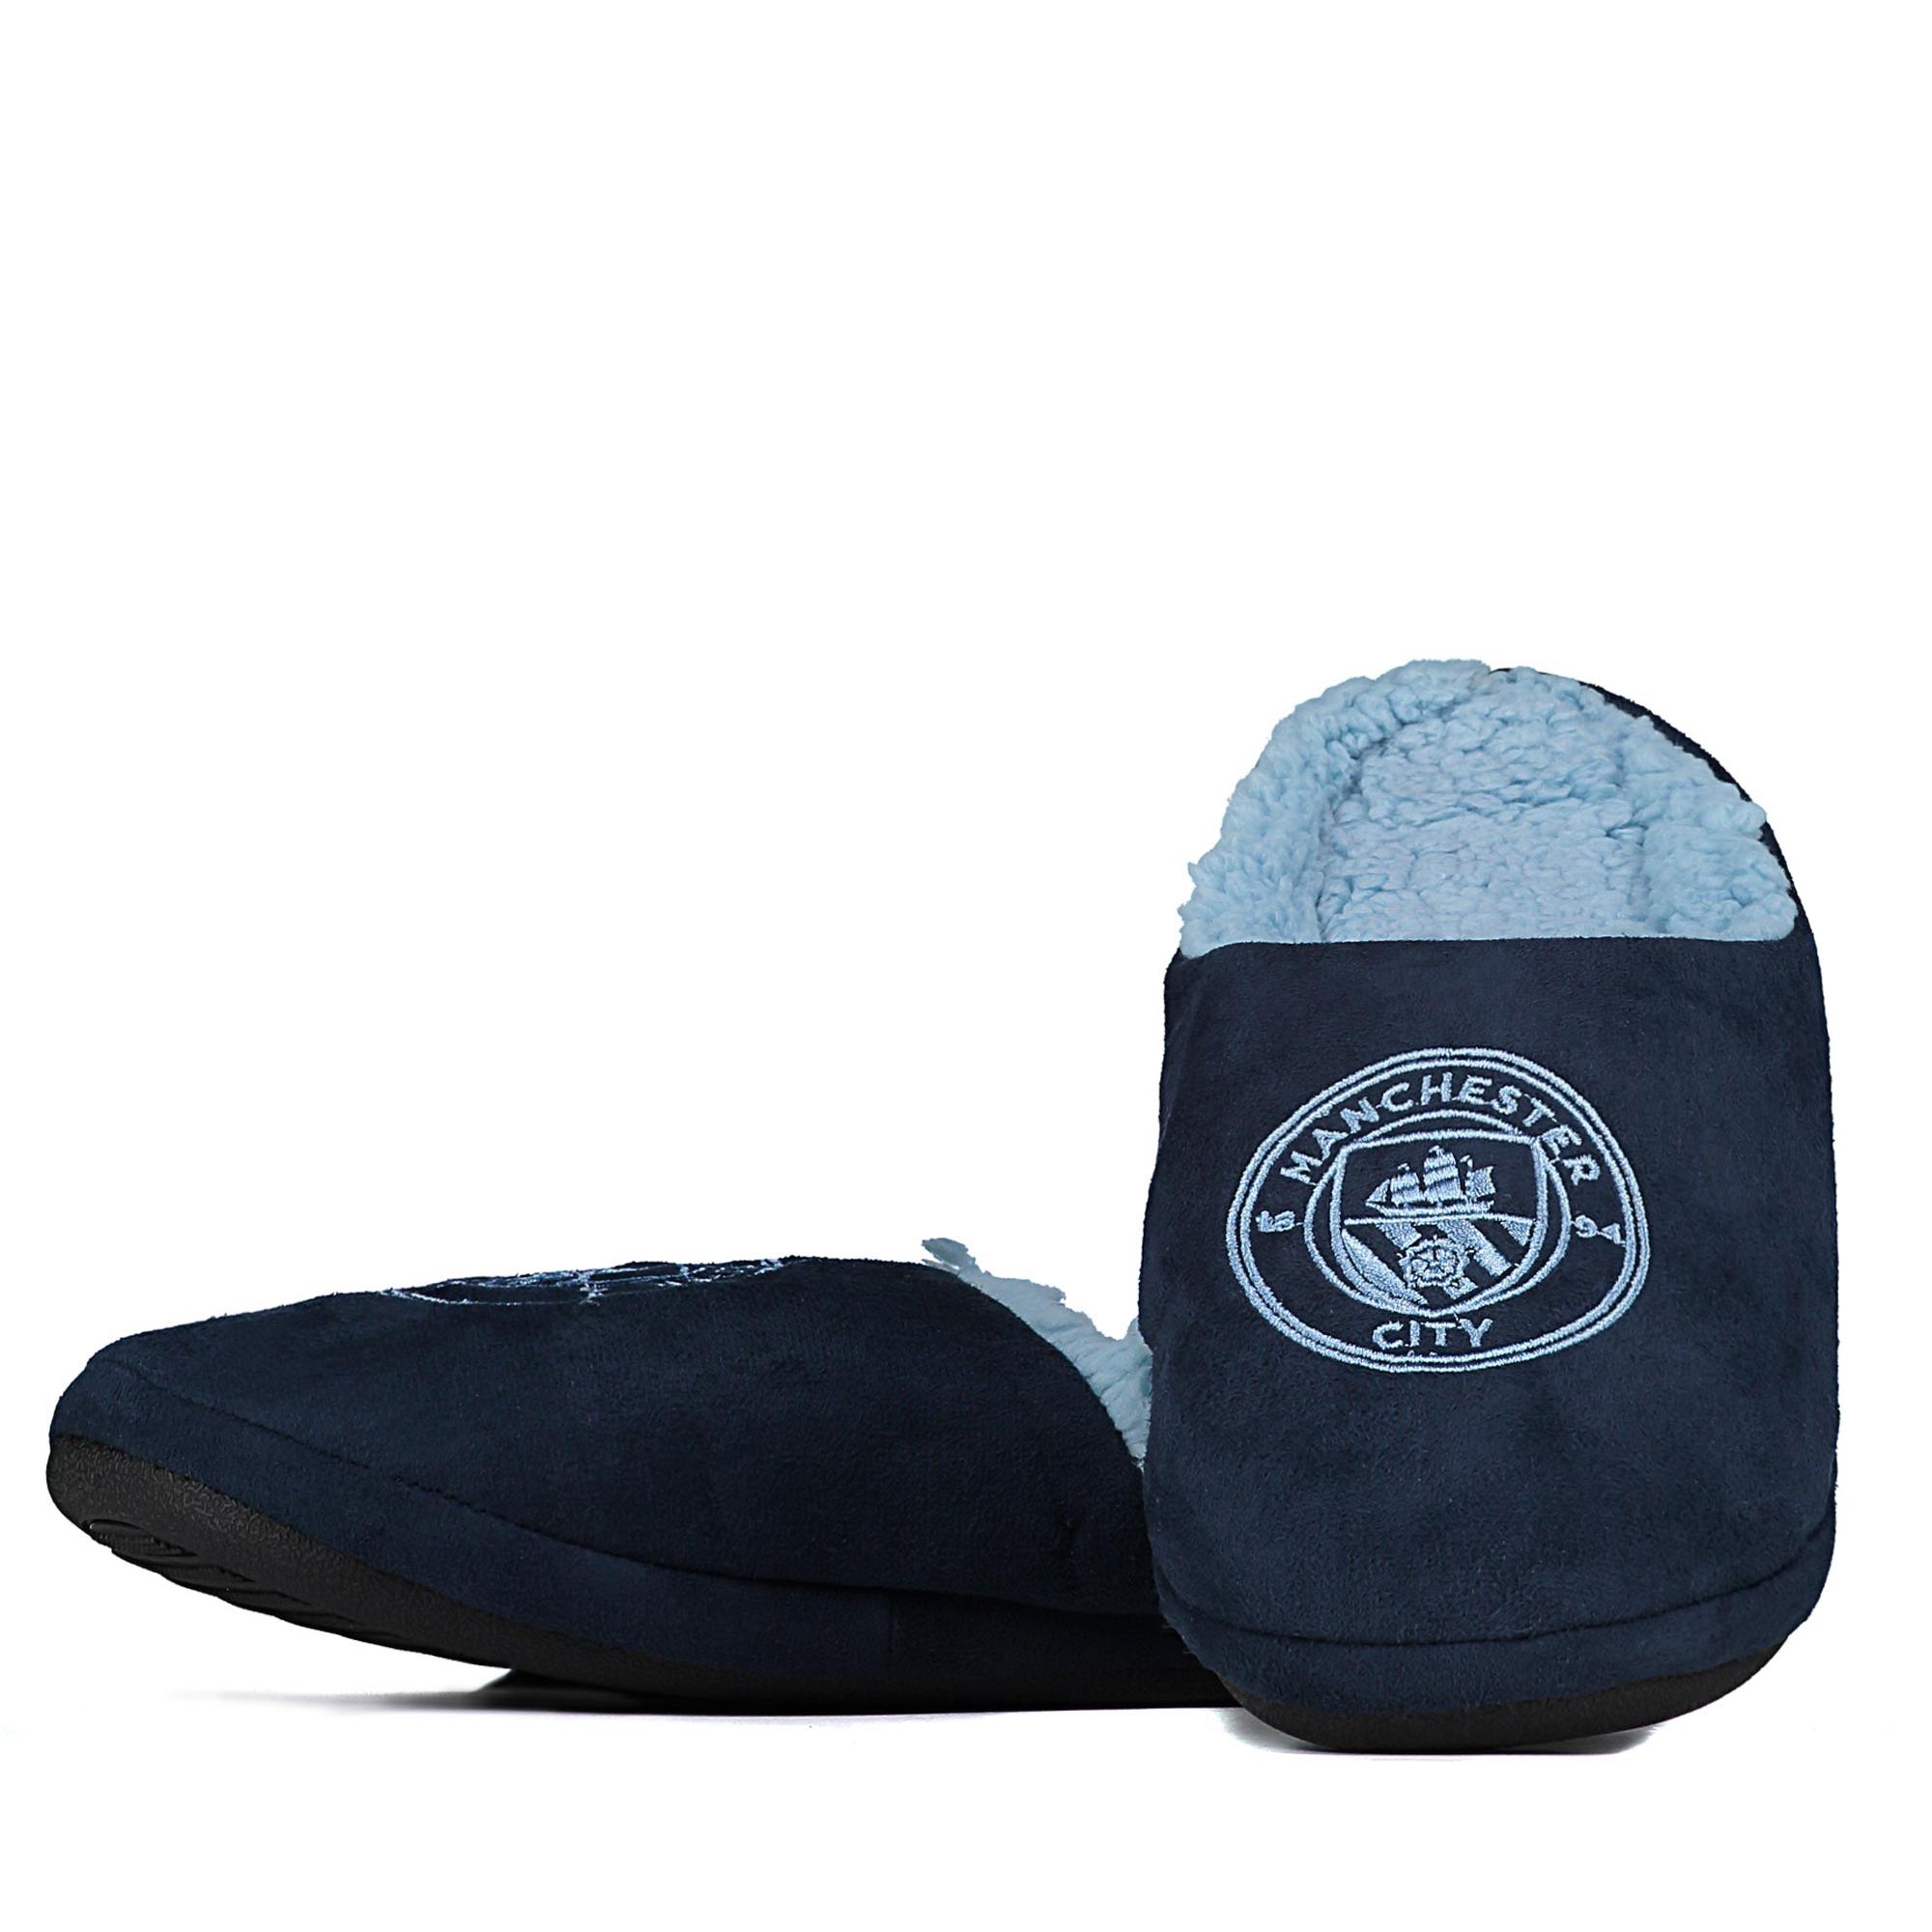 Manchester City Mule Slipper - Navy